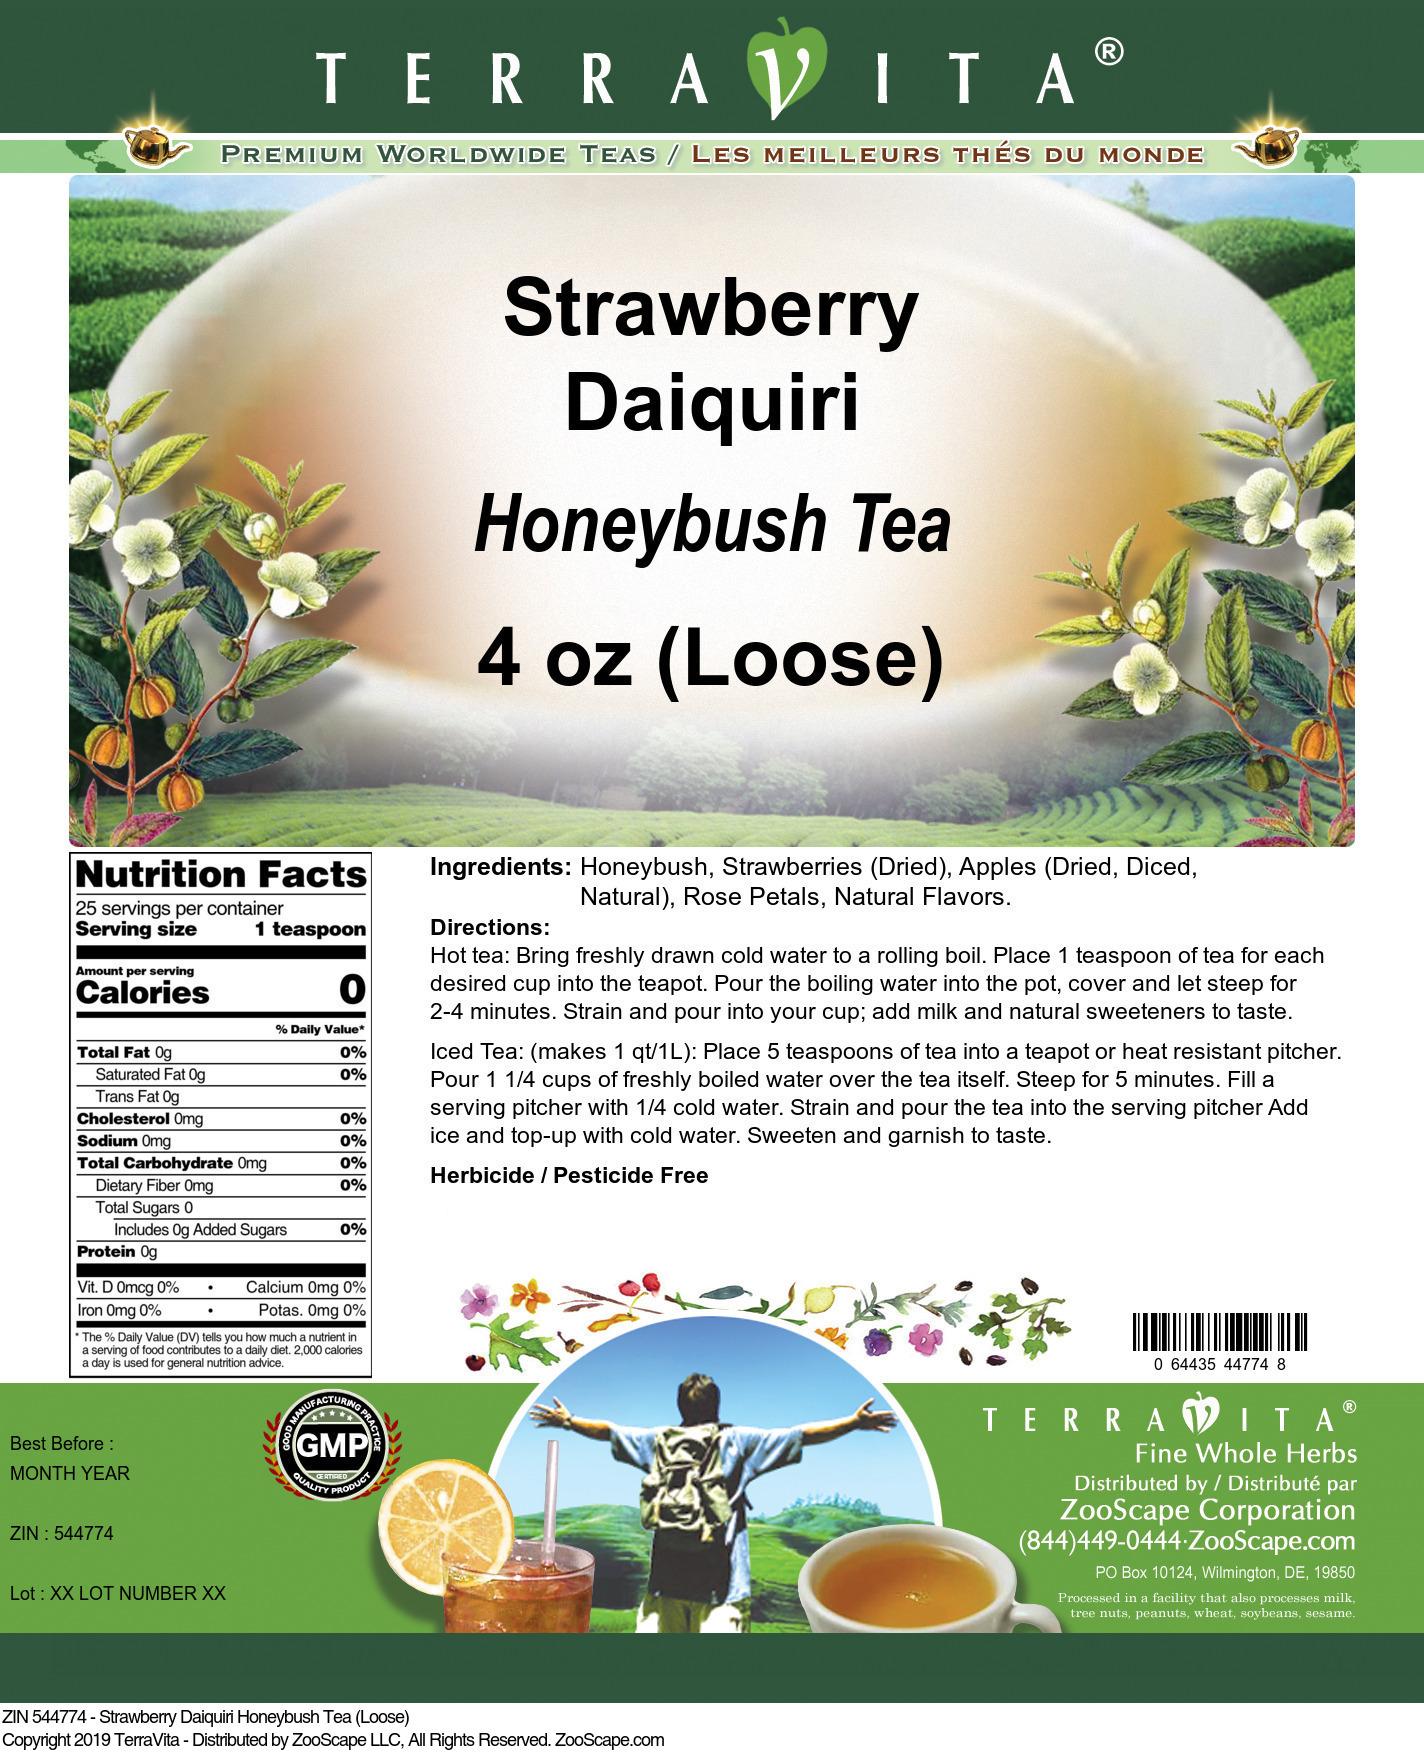 Strawberry Daiquiri Honeybush Tea (Loose)